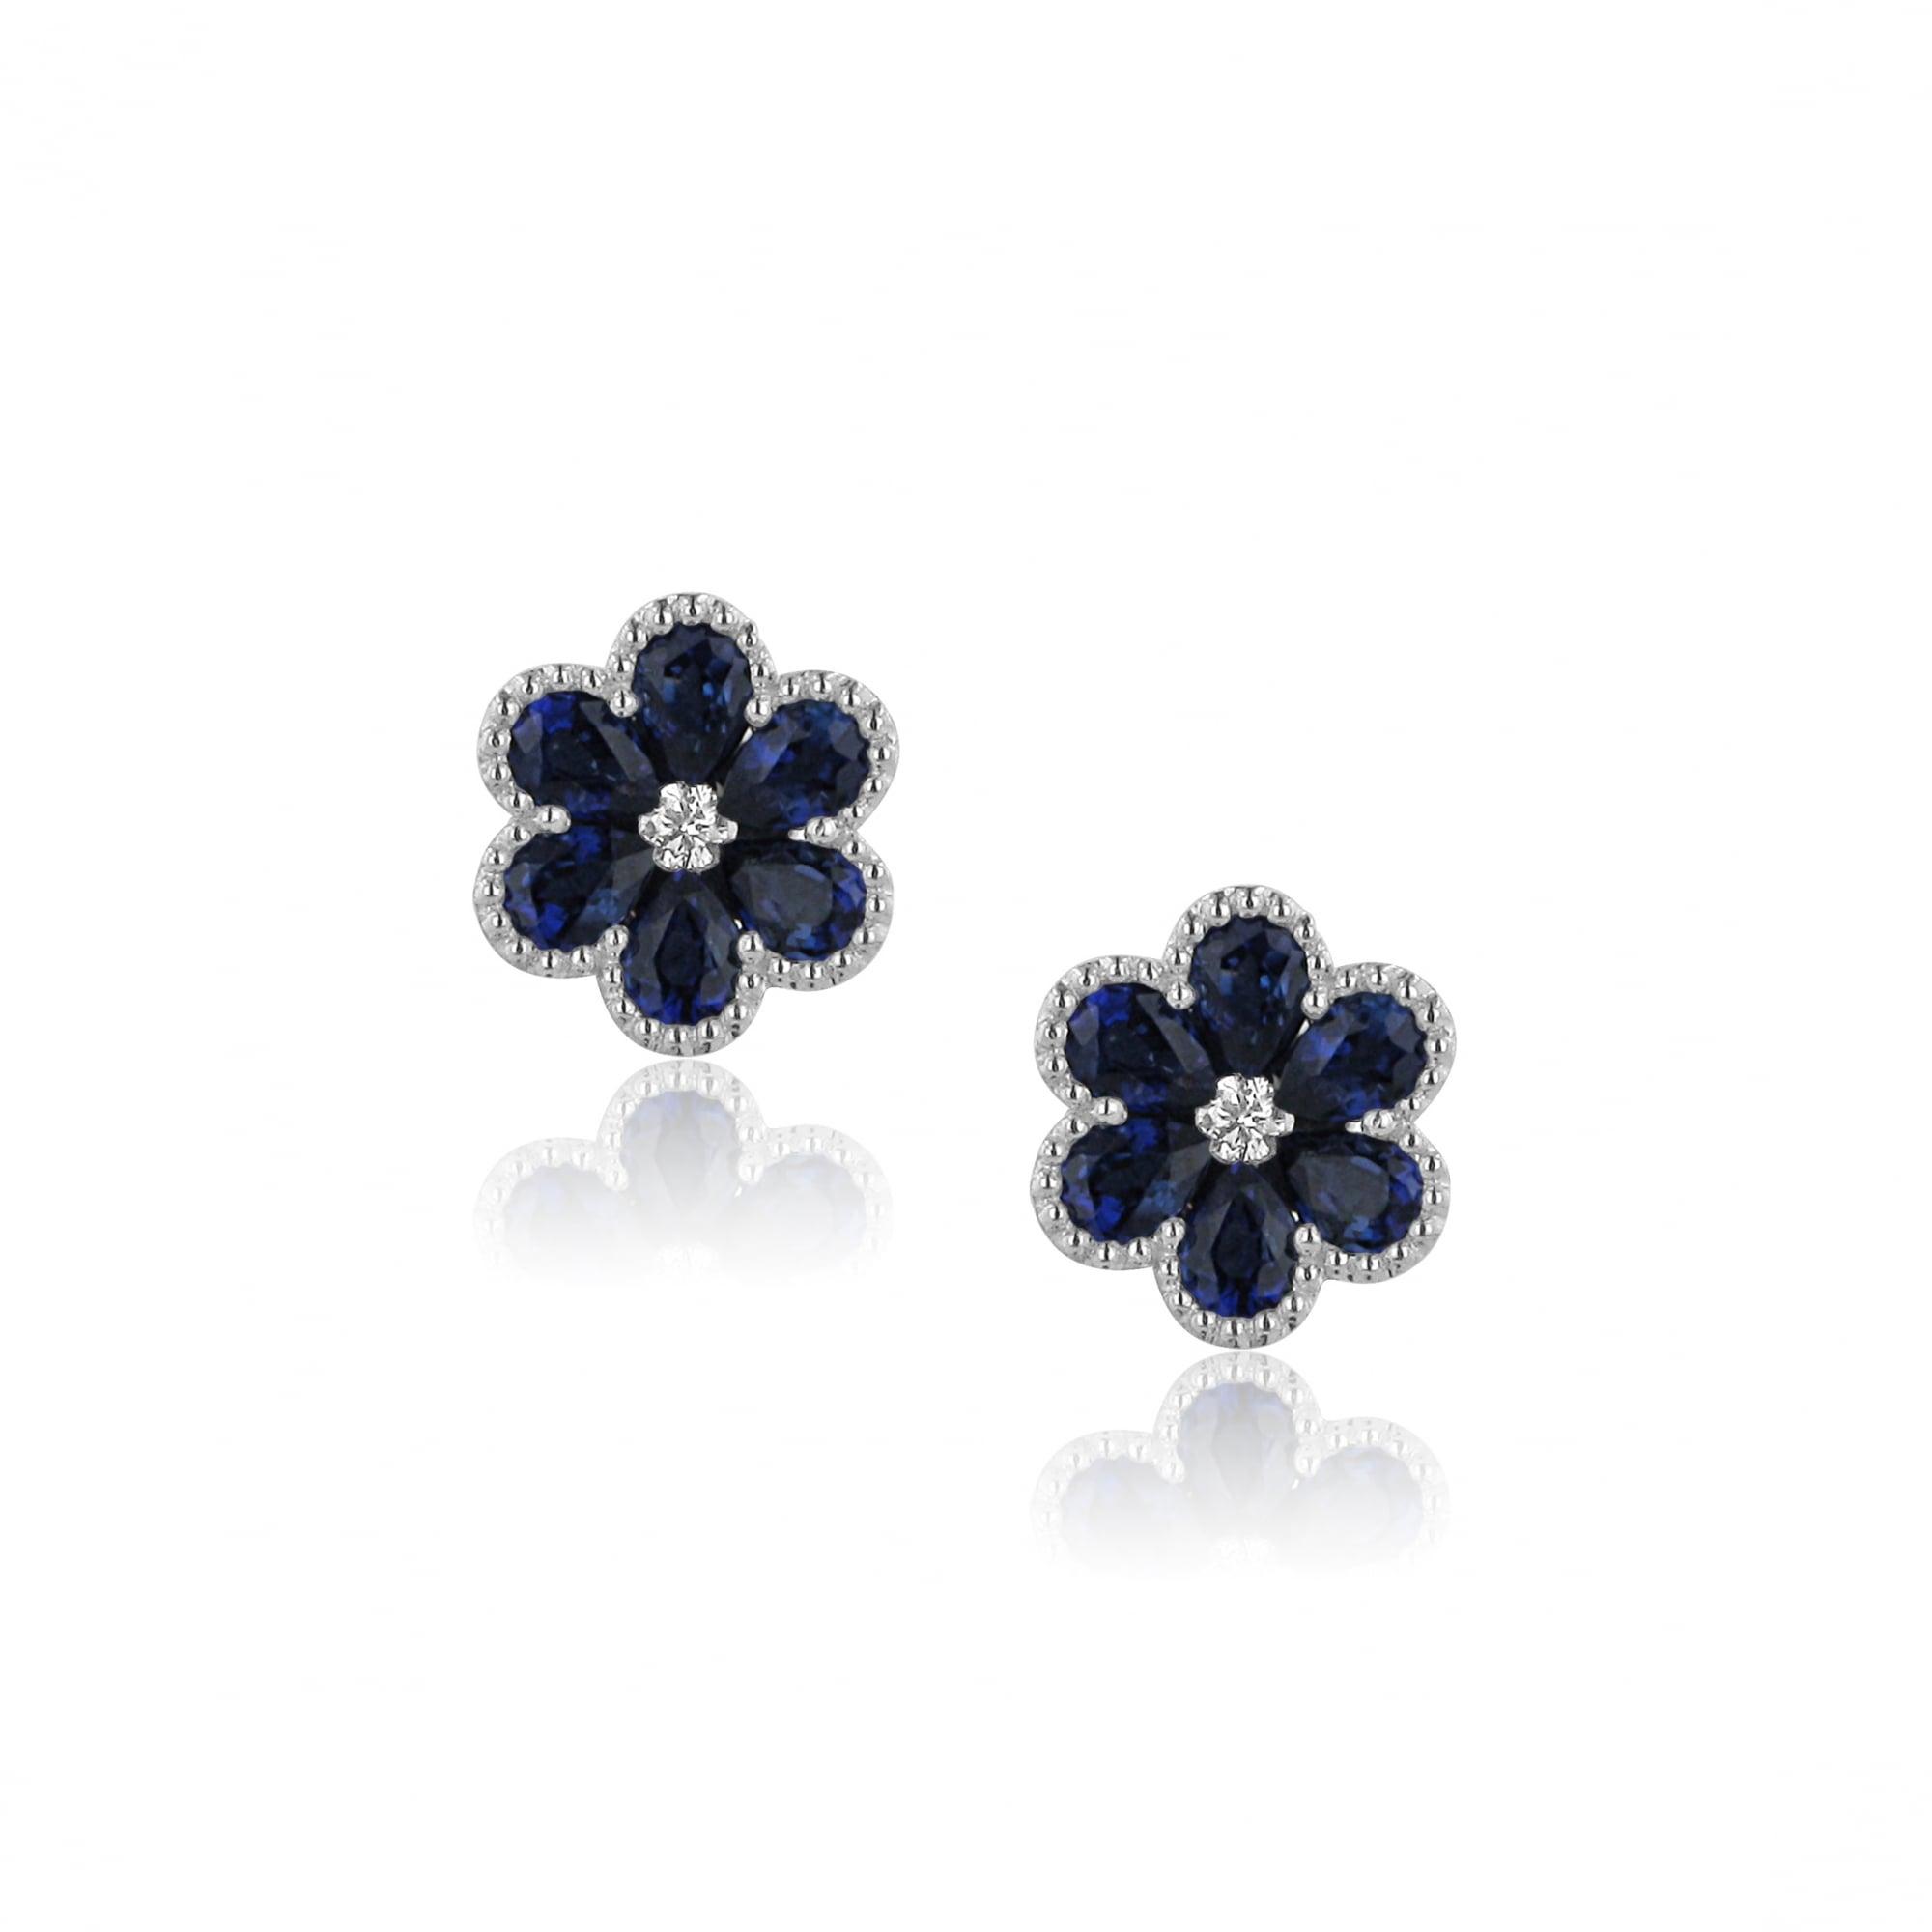 18ct White Gold Blue Sapphire Flower Earrings Womens From Avanti